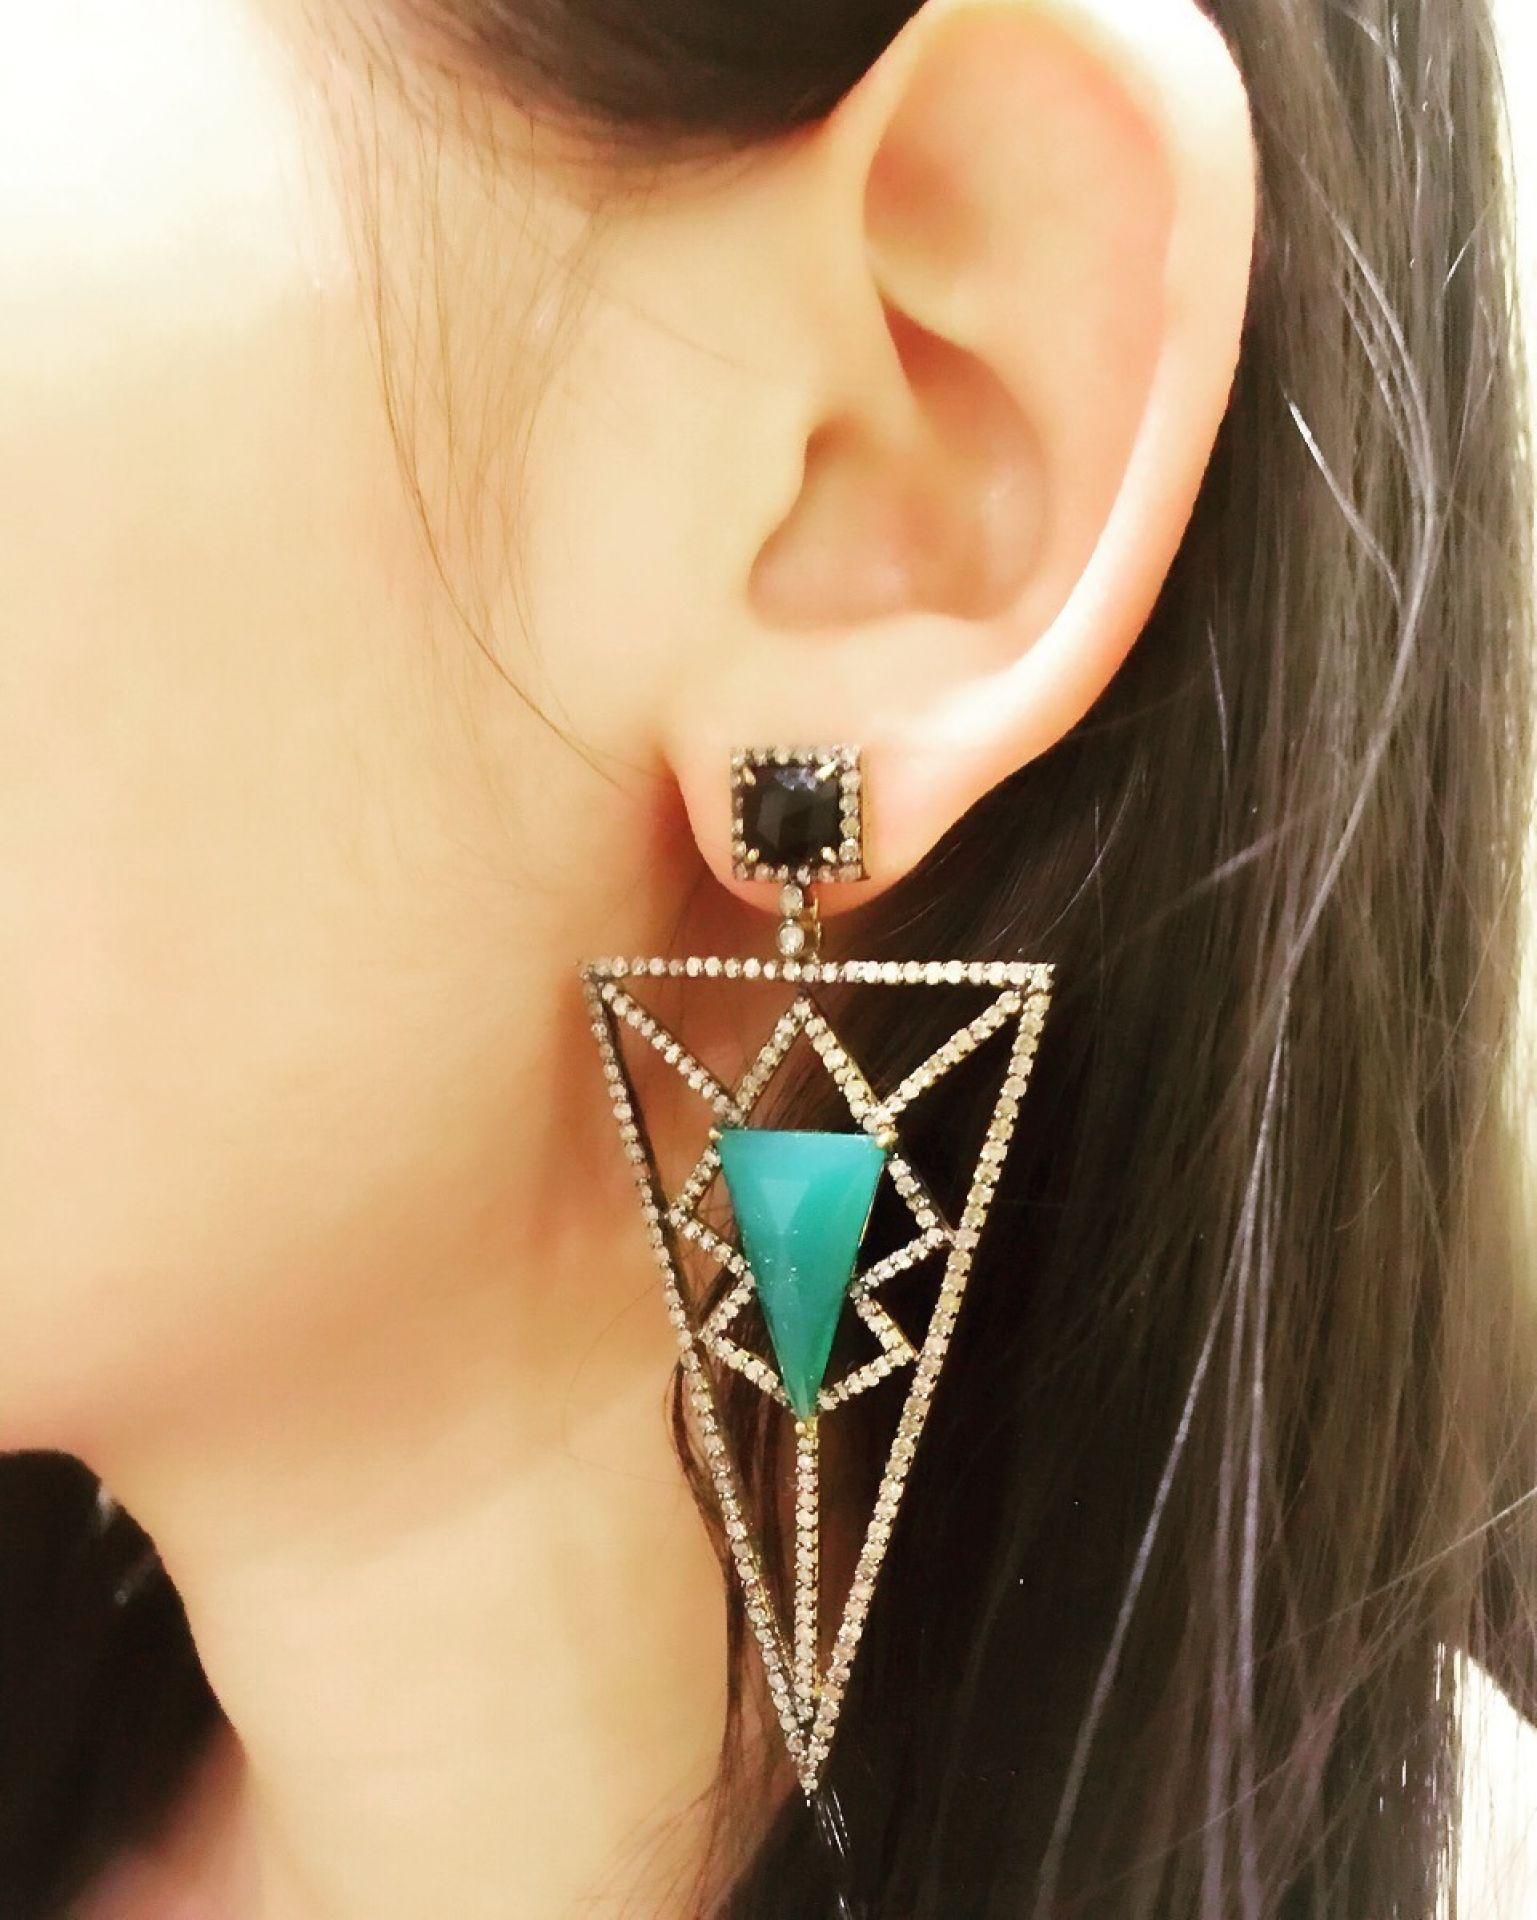 Meghna Jewels Pyramid Earring - Green Onyx and Diamonds